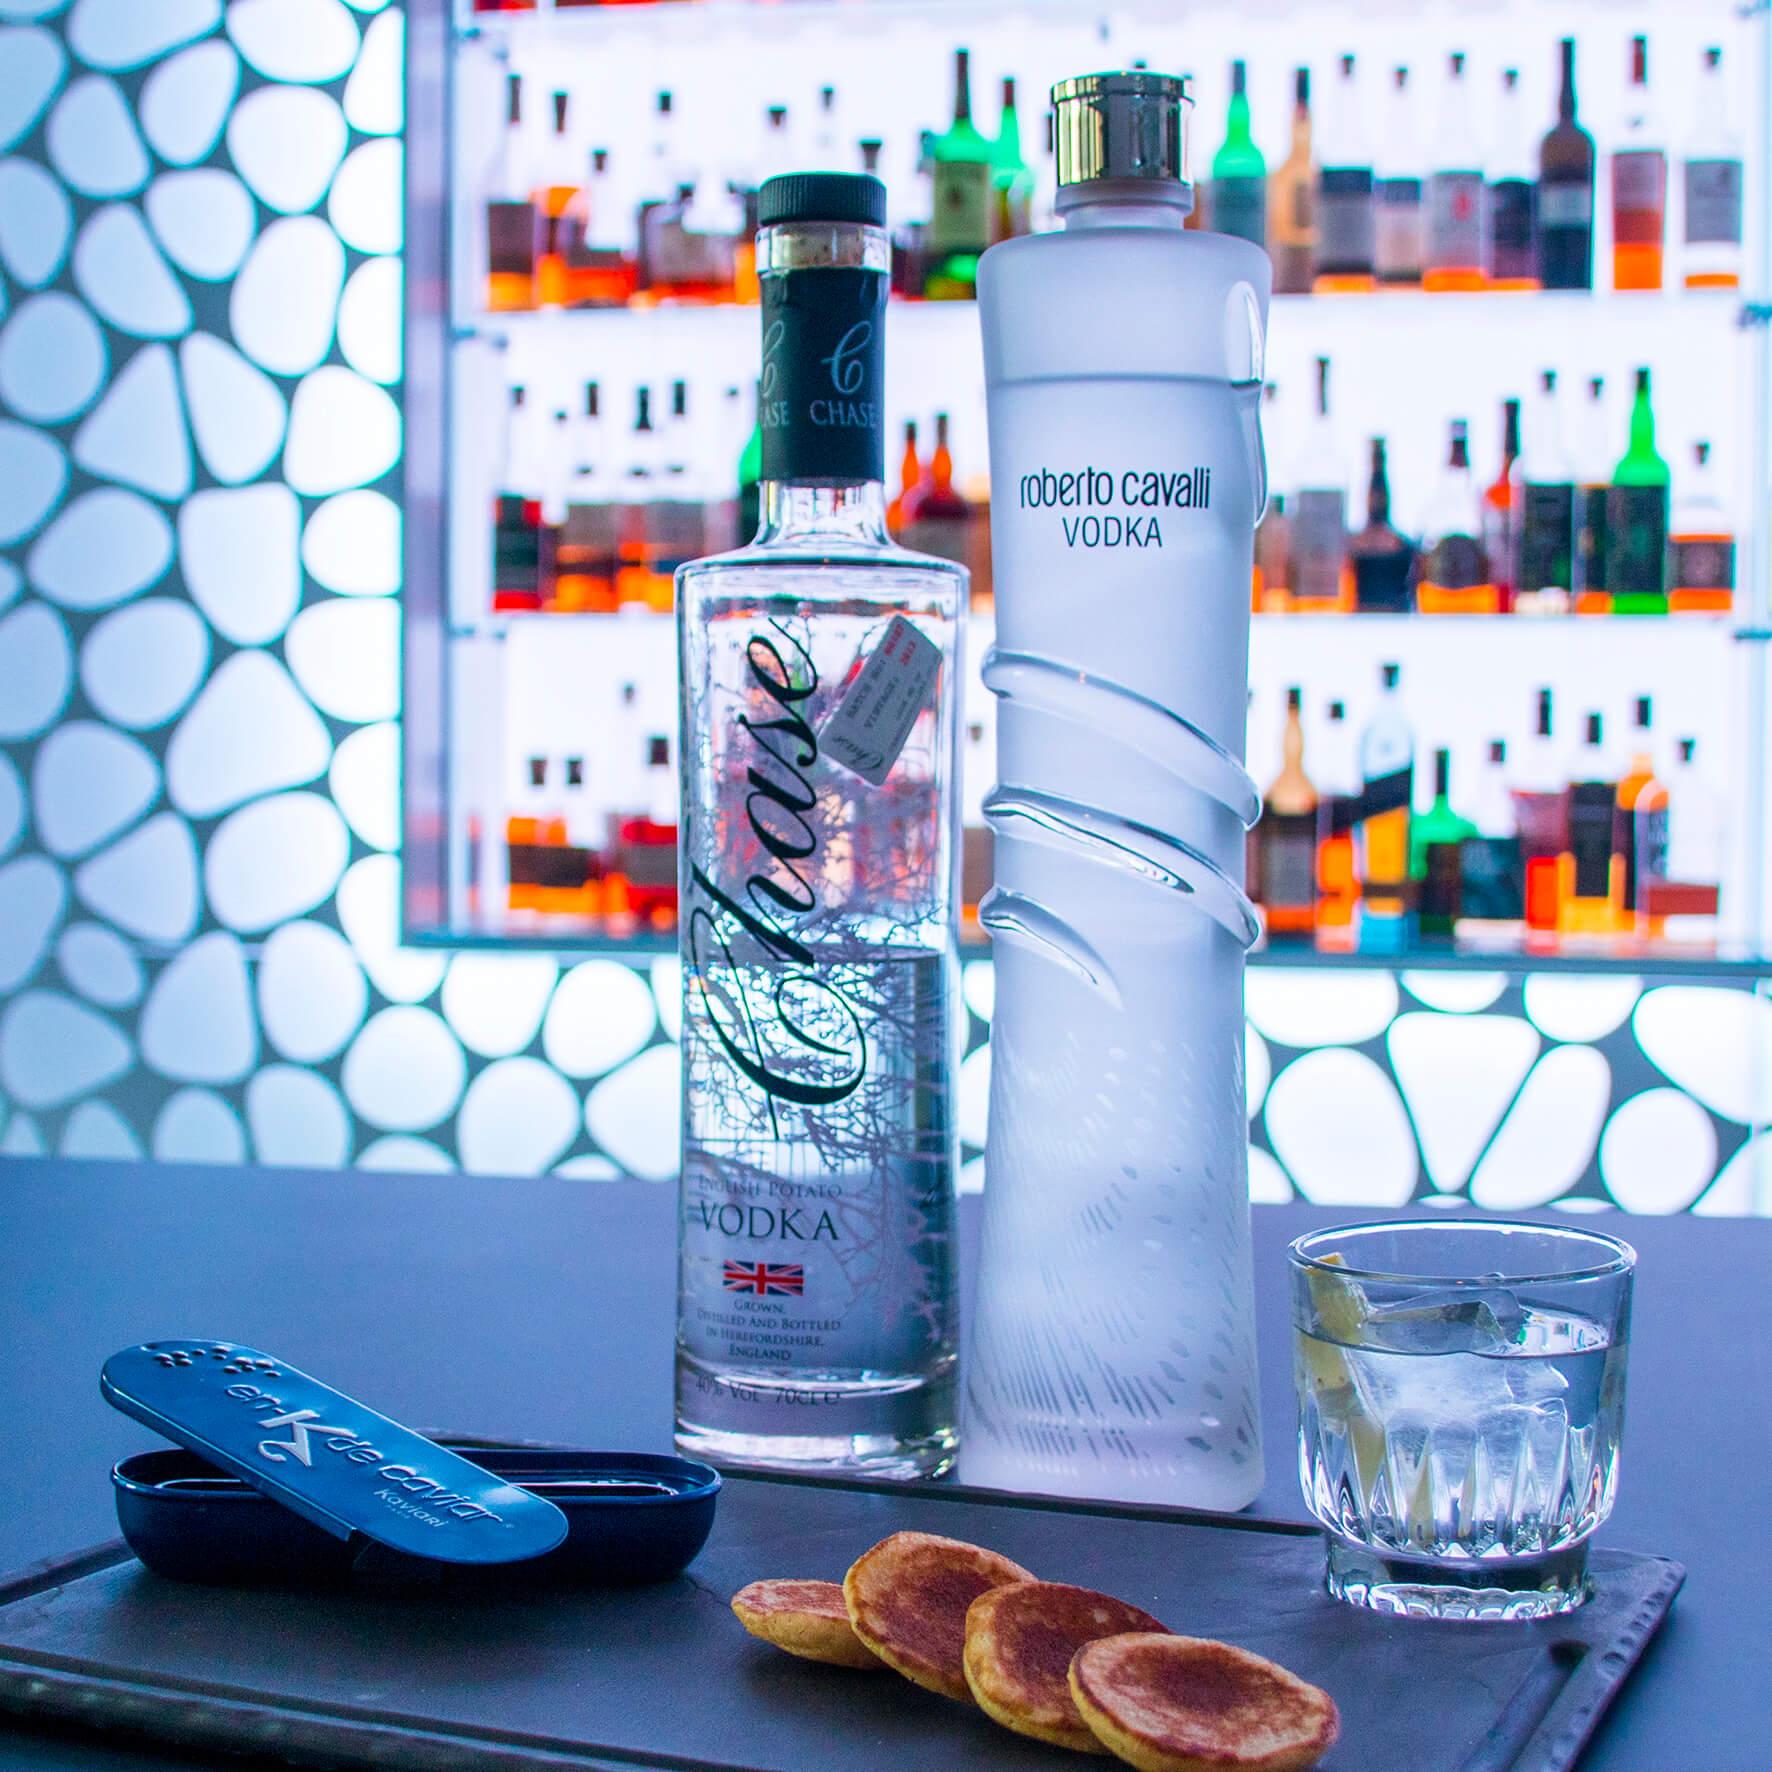 Caviar et vodka